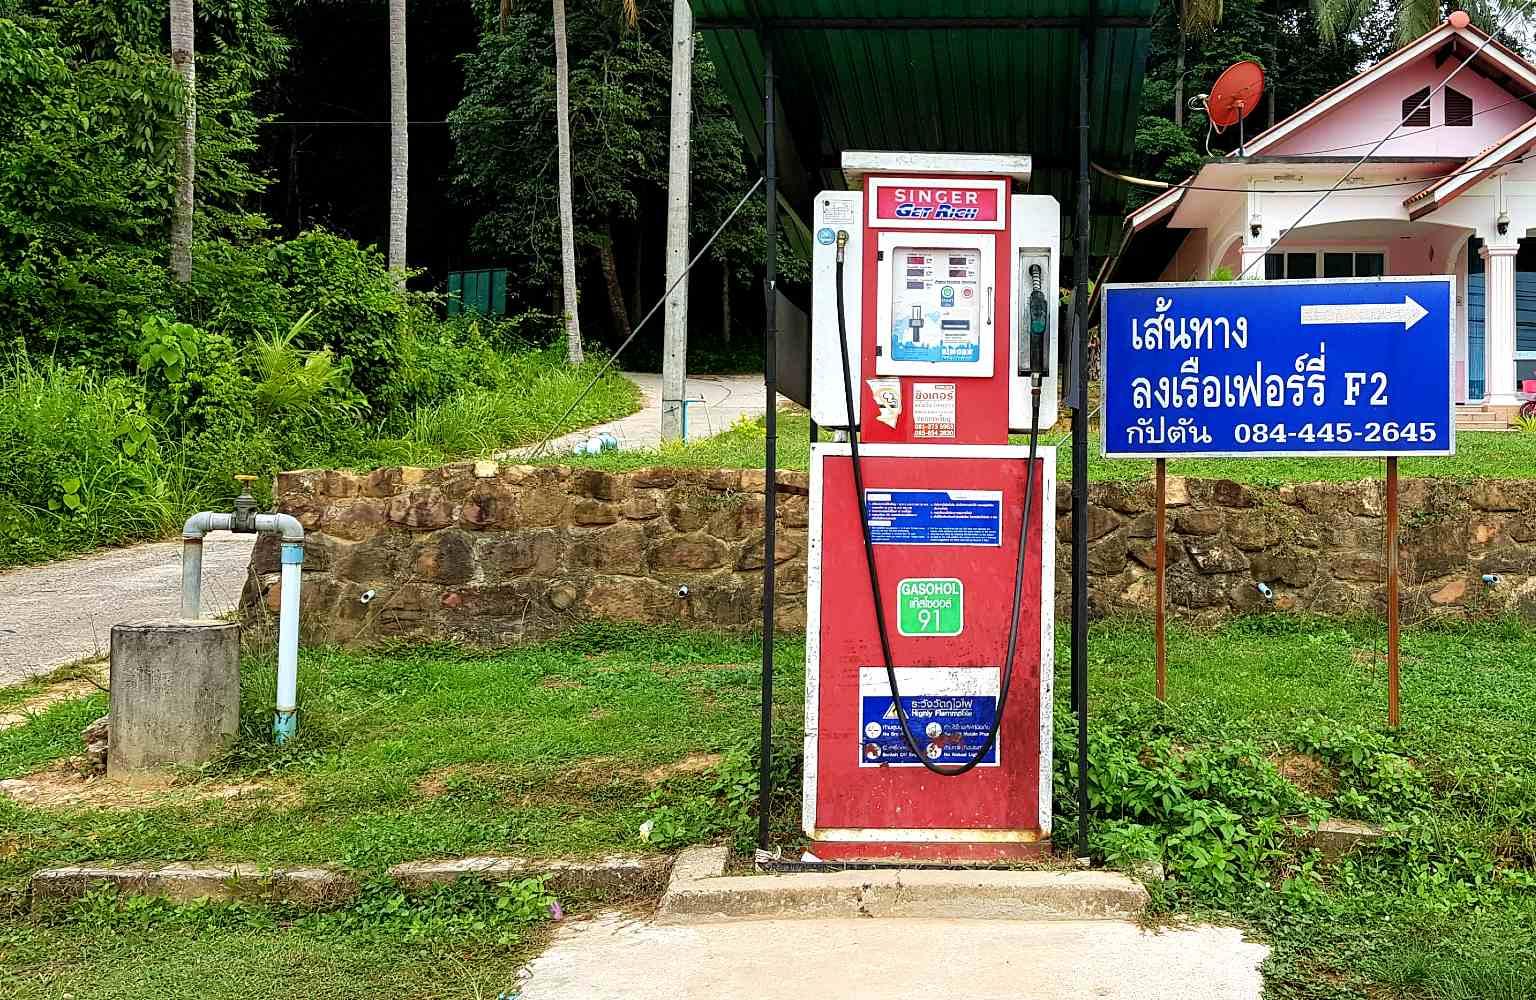 A gas station along the road on Koh Yai Yai